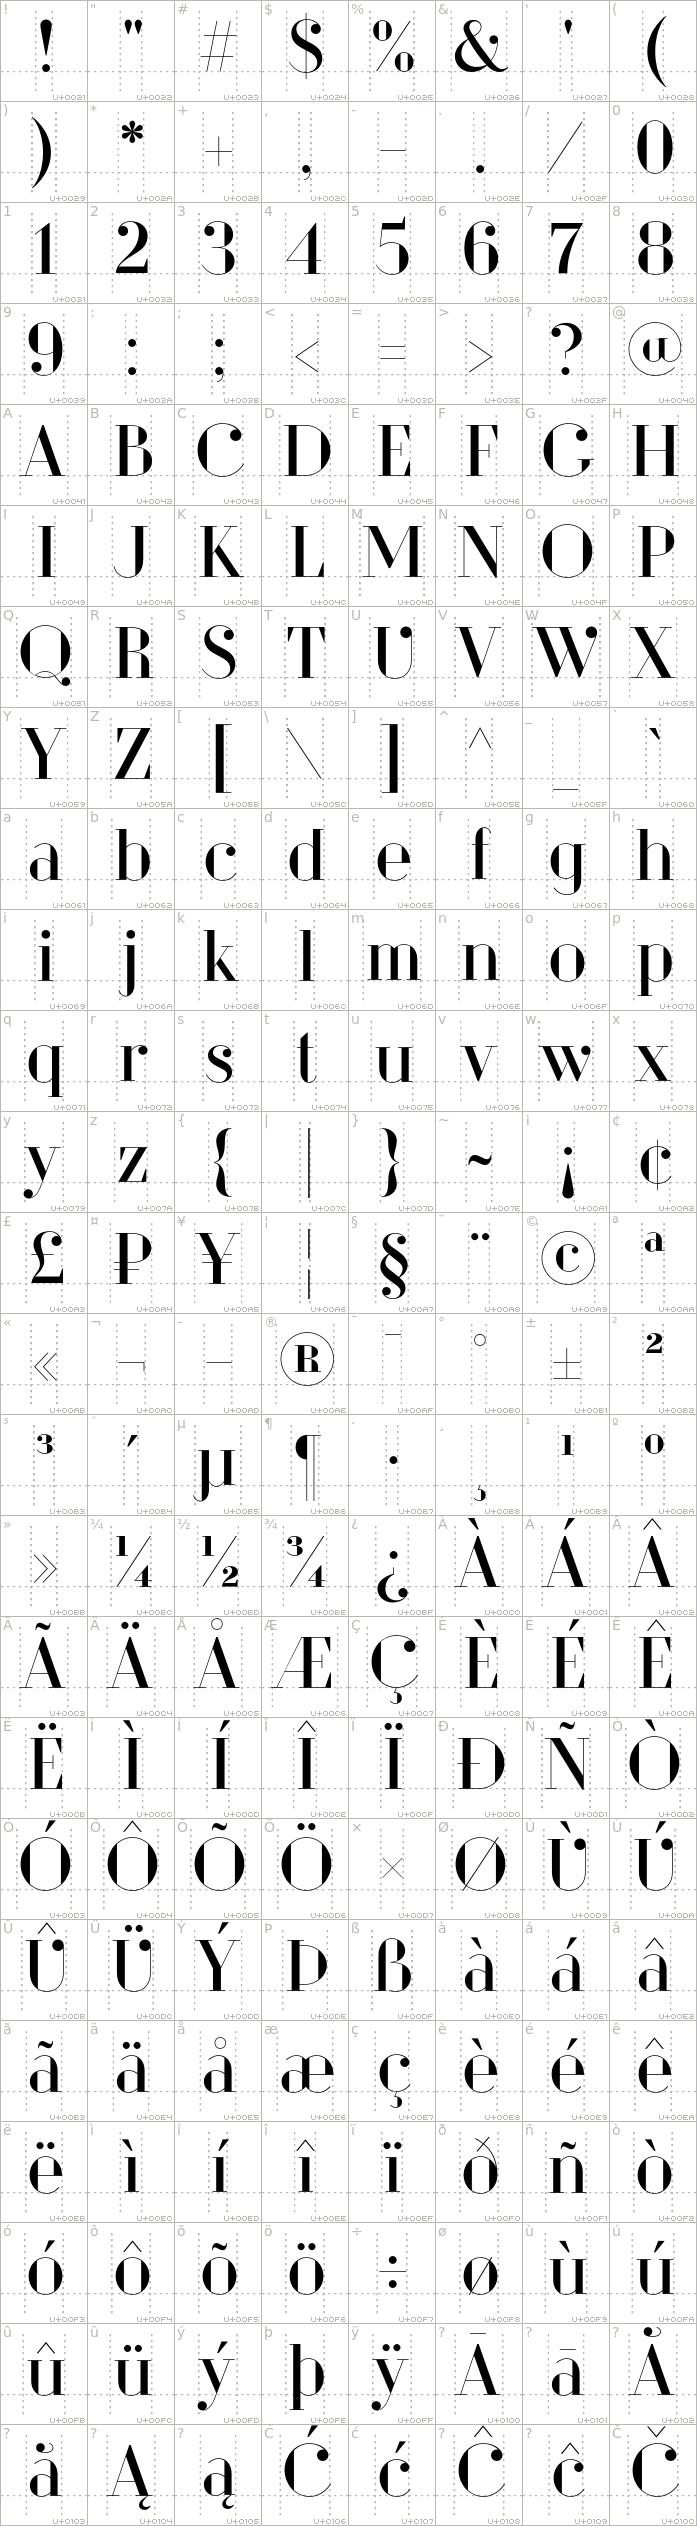 dita-sweet.regular.character-map-1